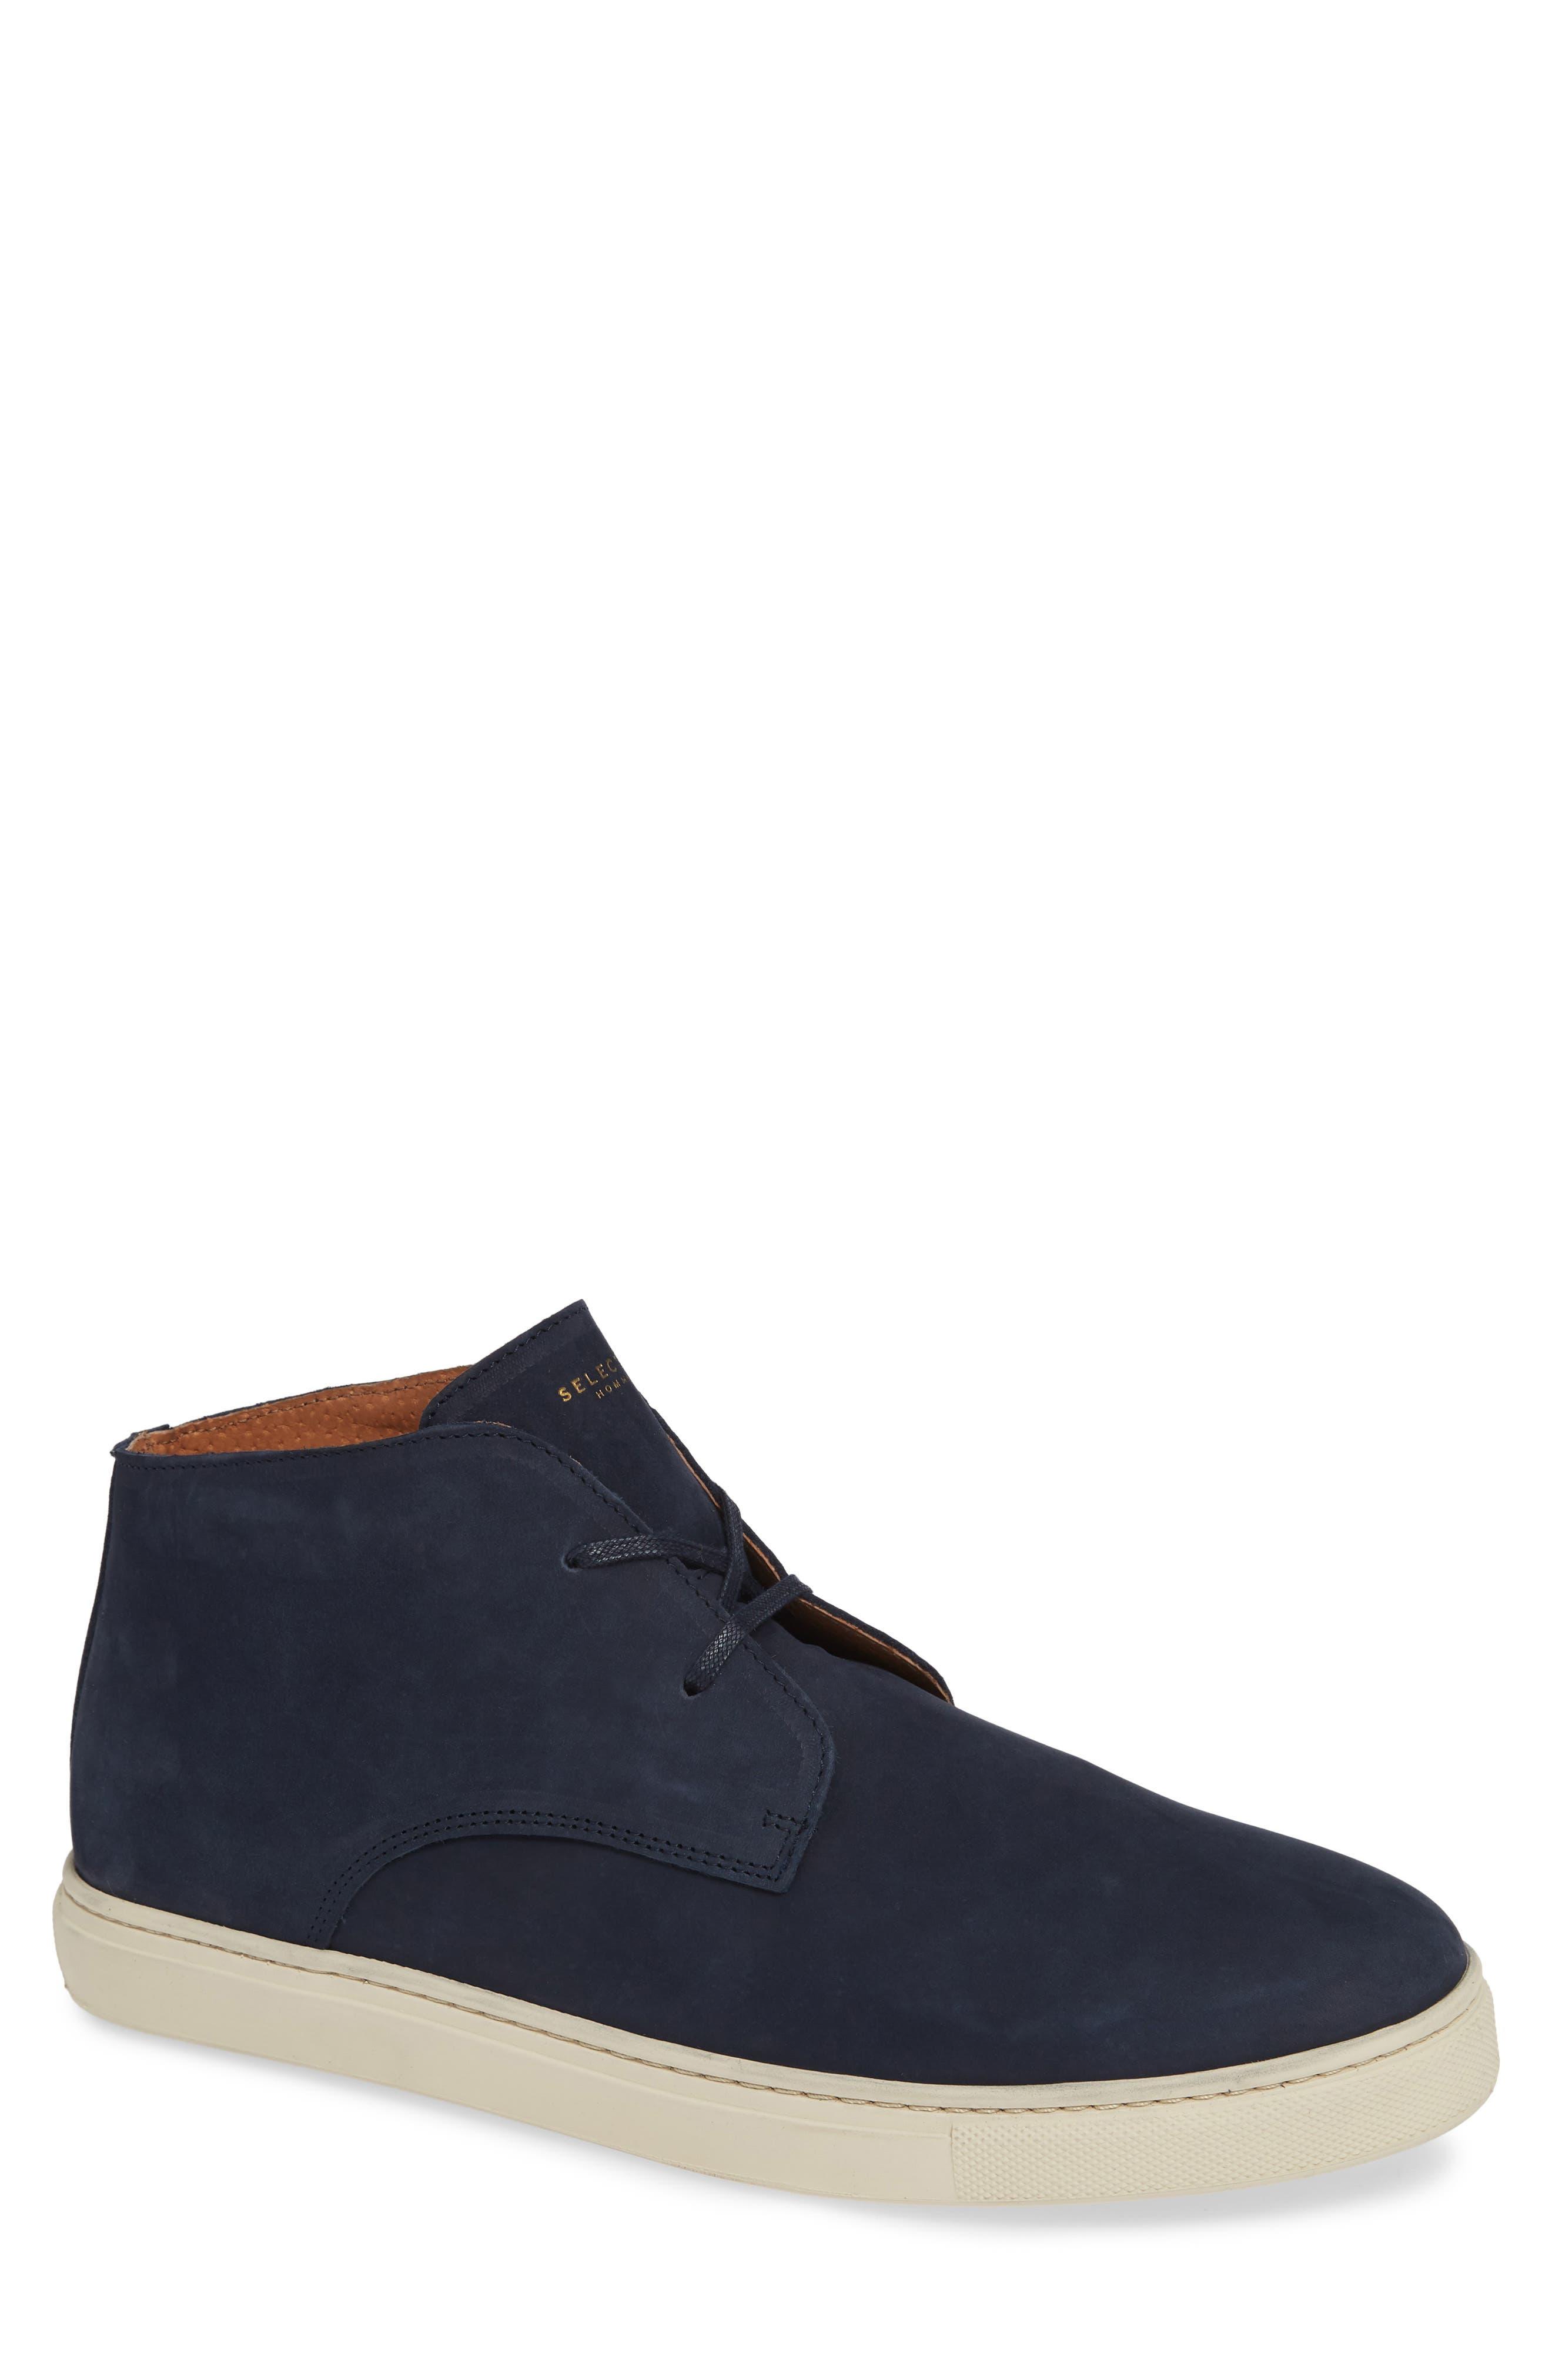 Dempsey Chukka Sneaker,                         Main,                         color, DARK NAVY